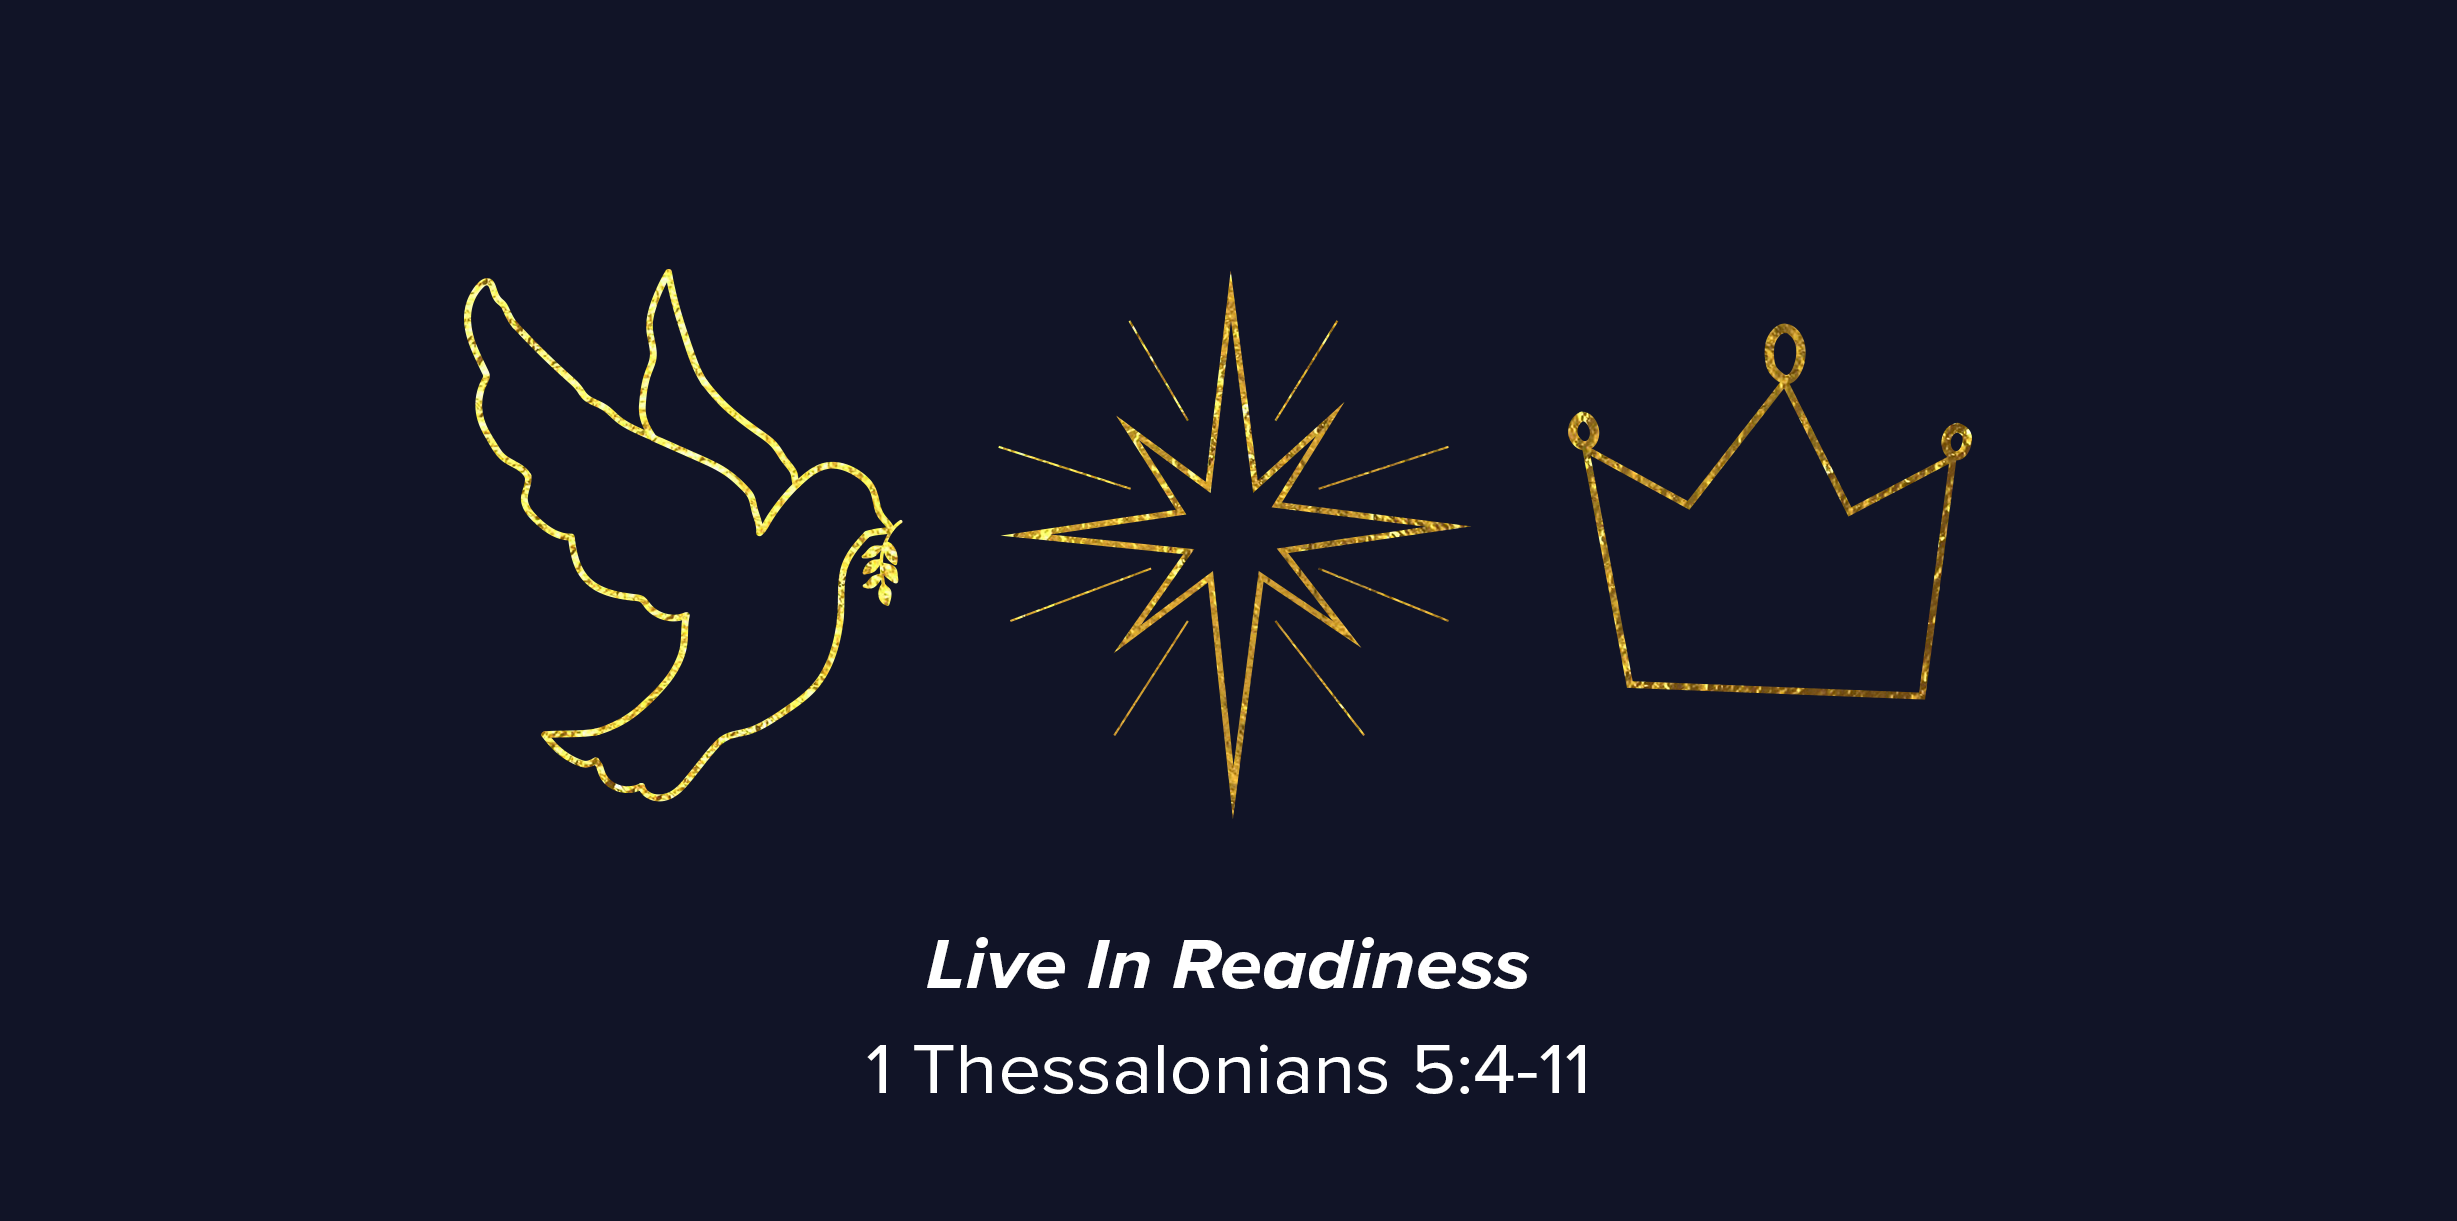 03-LiveInReadiness-2018.png